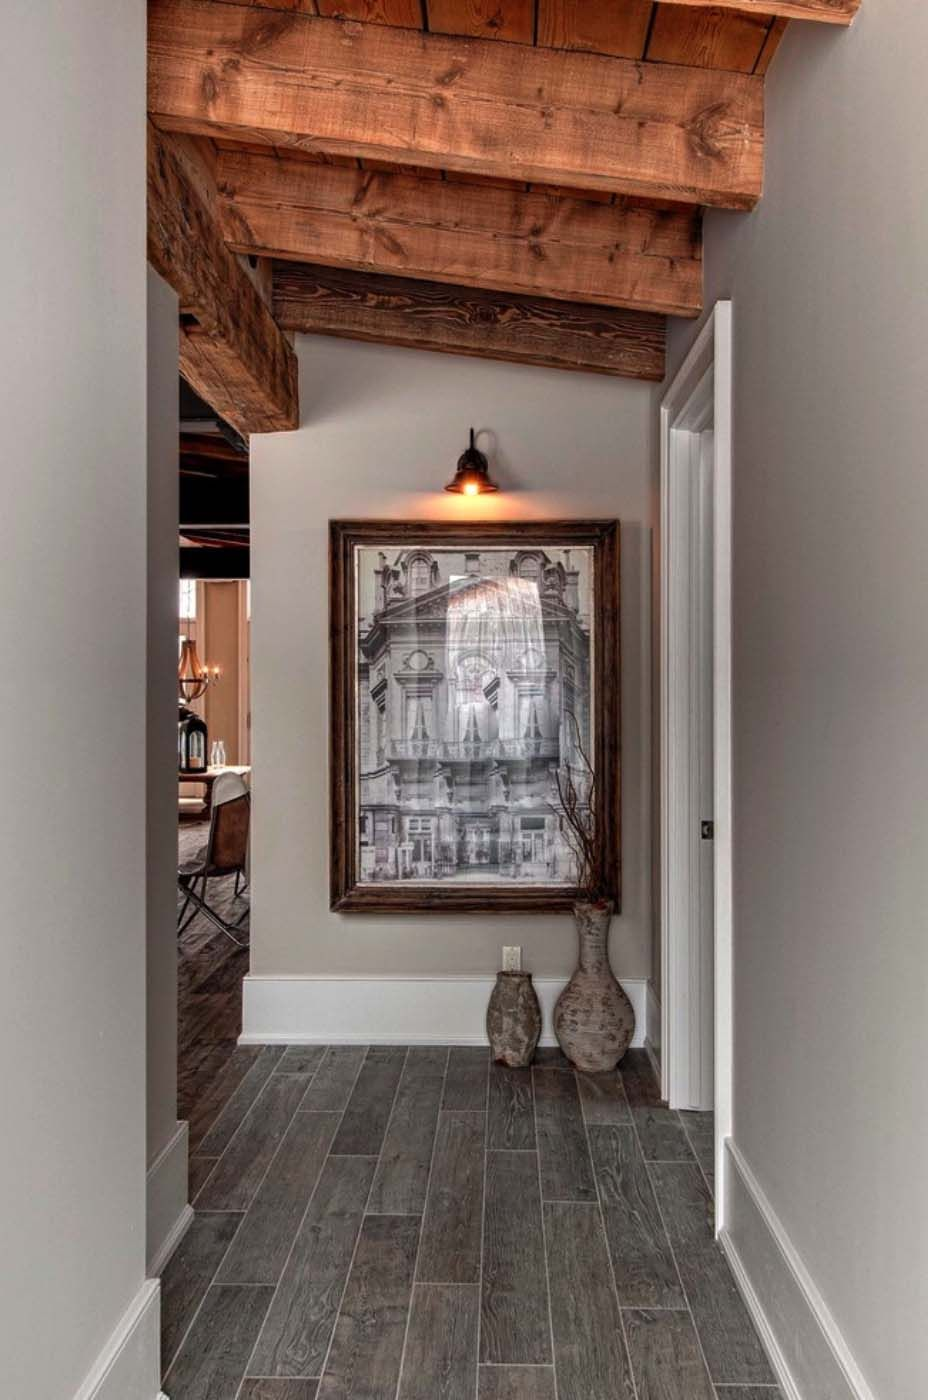 Captivating Luxury Canadian Home Reveals Splendid Rustic Modern Aesthetic